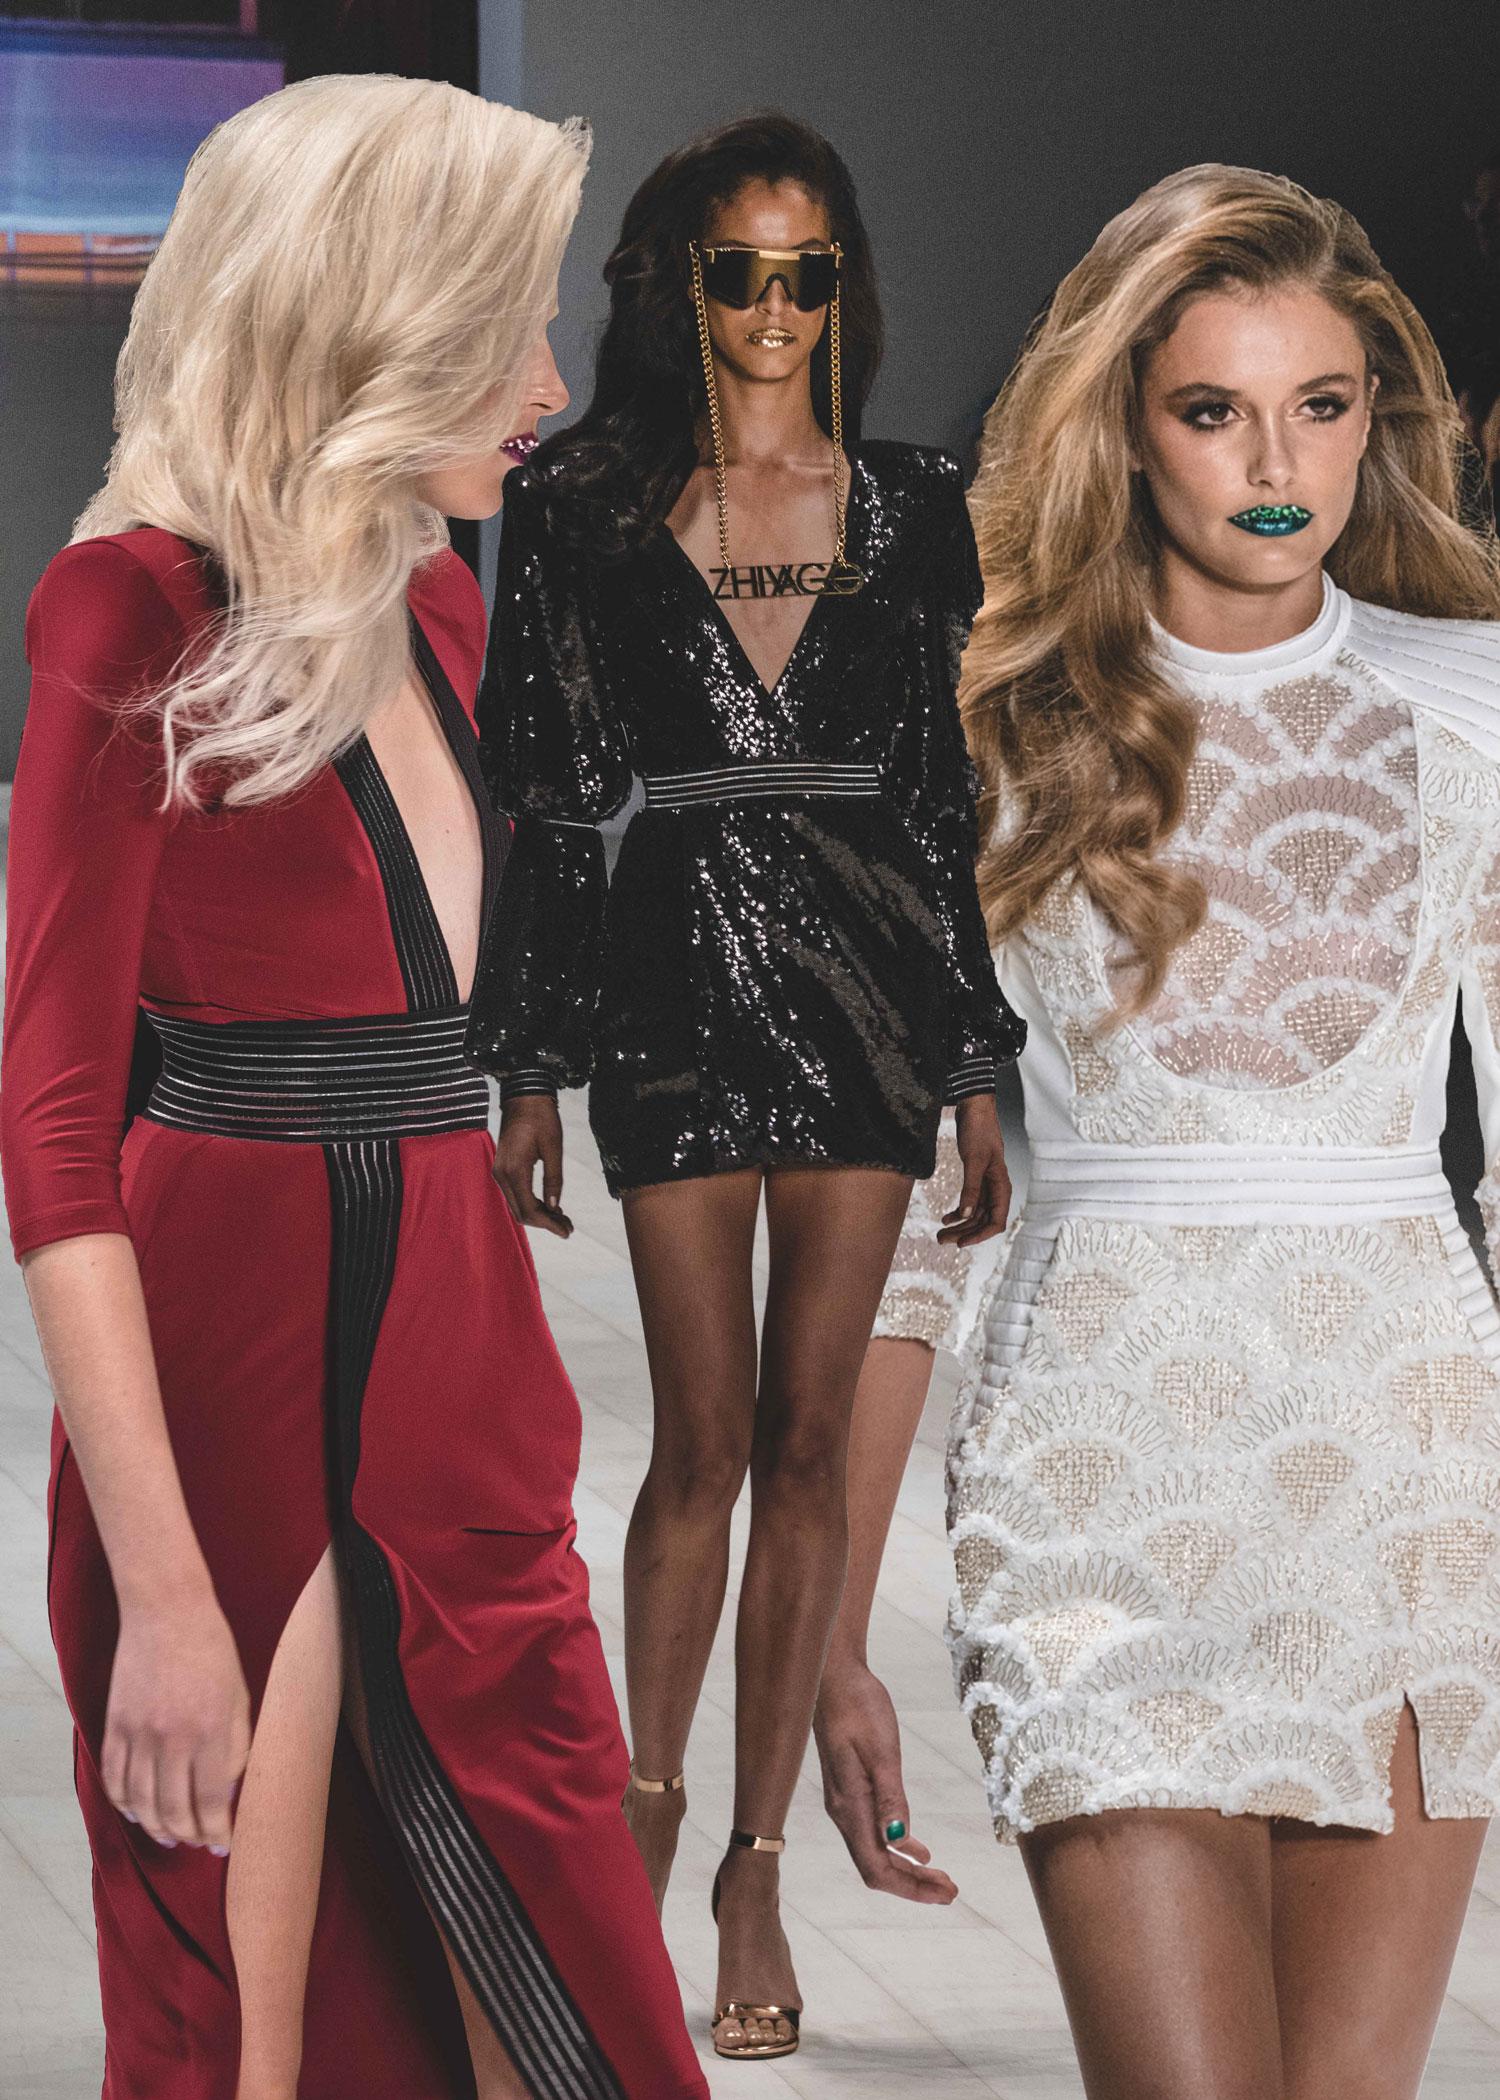 the-fashion-heist-mbfwa-2017-zhivago-azar-image-5554-edit